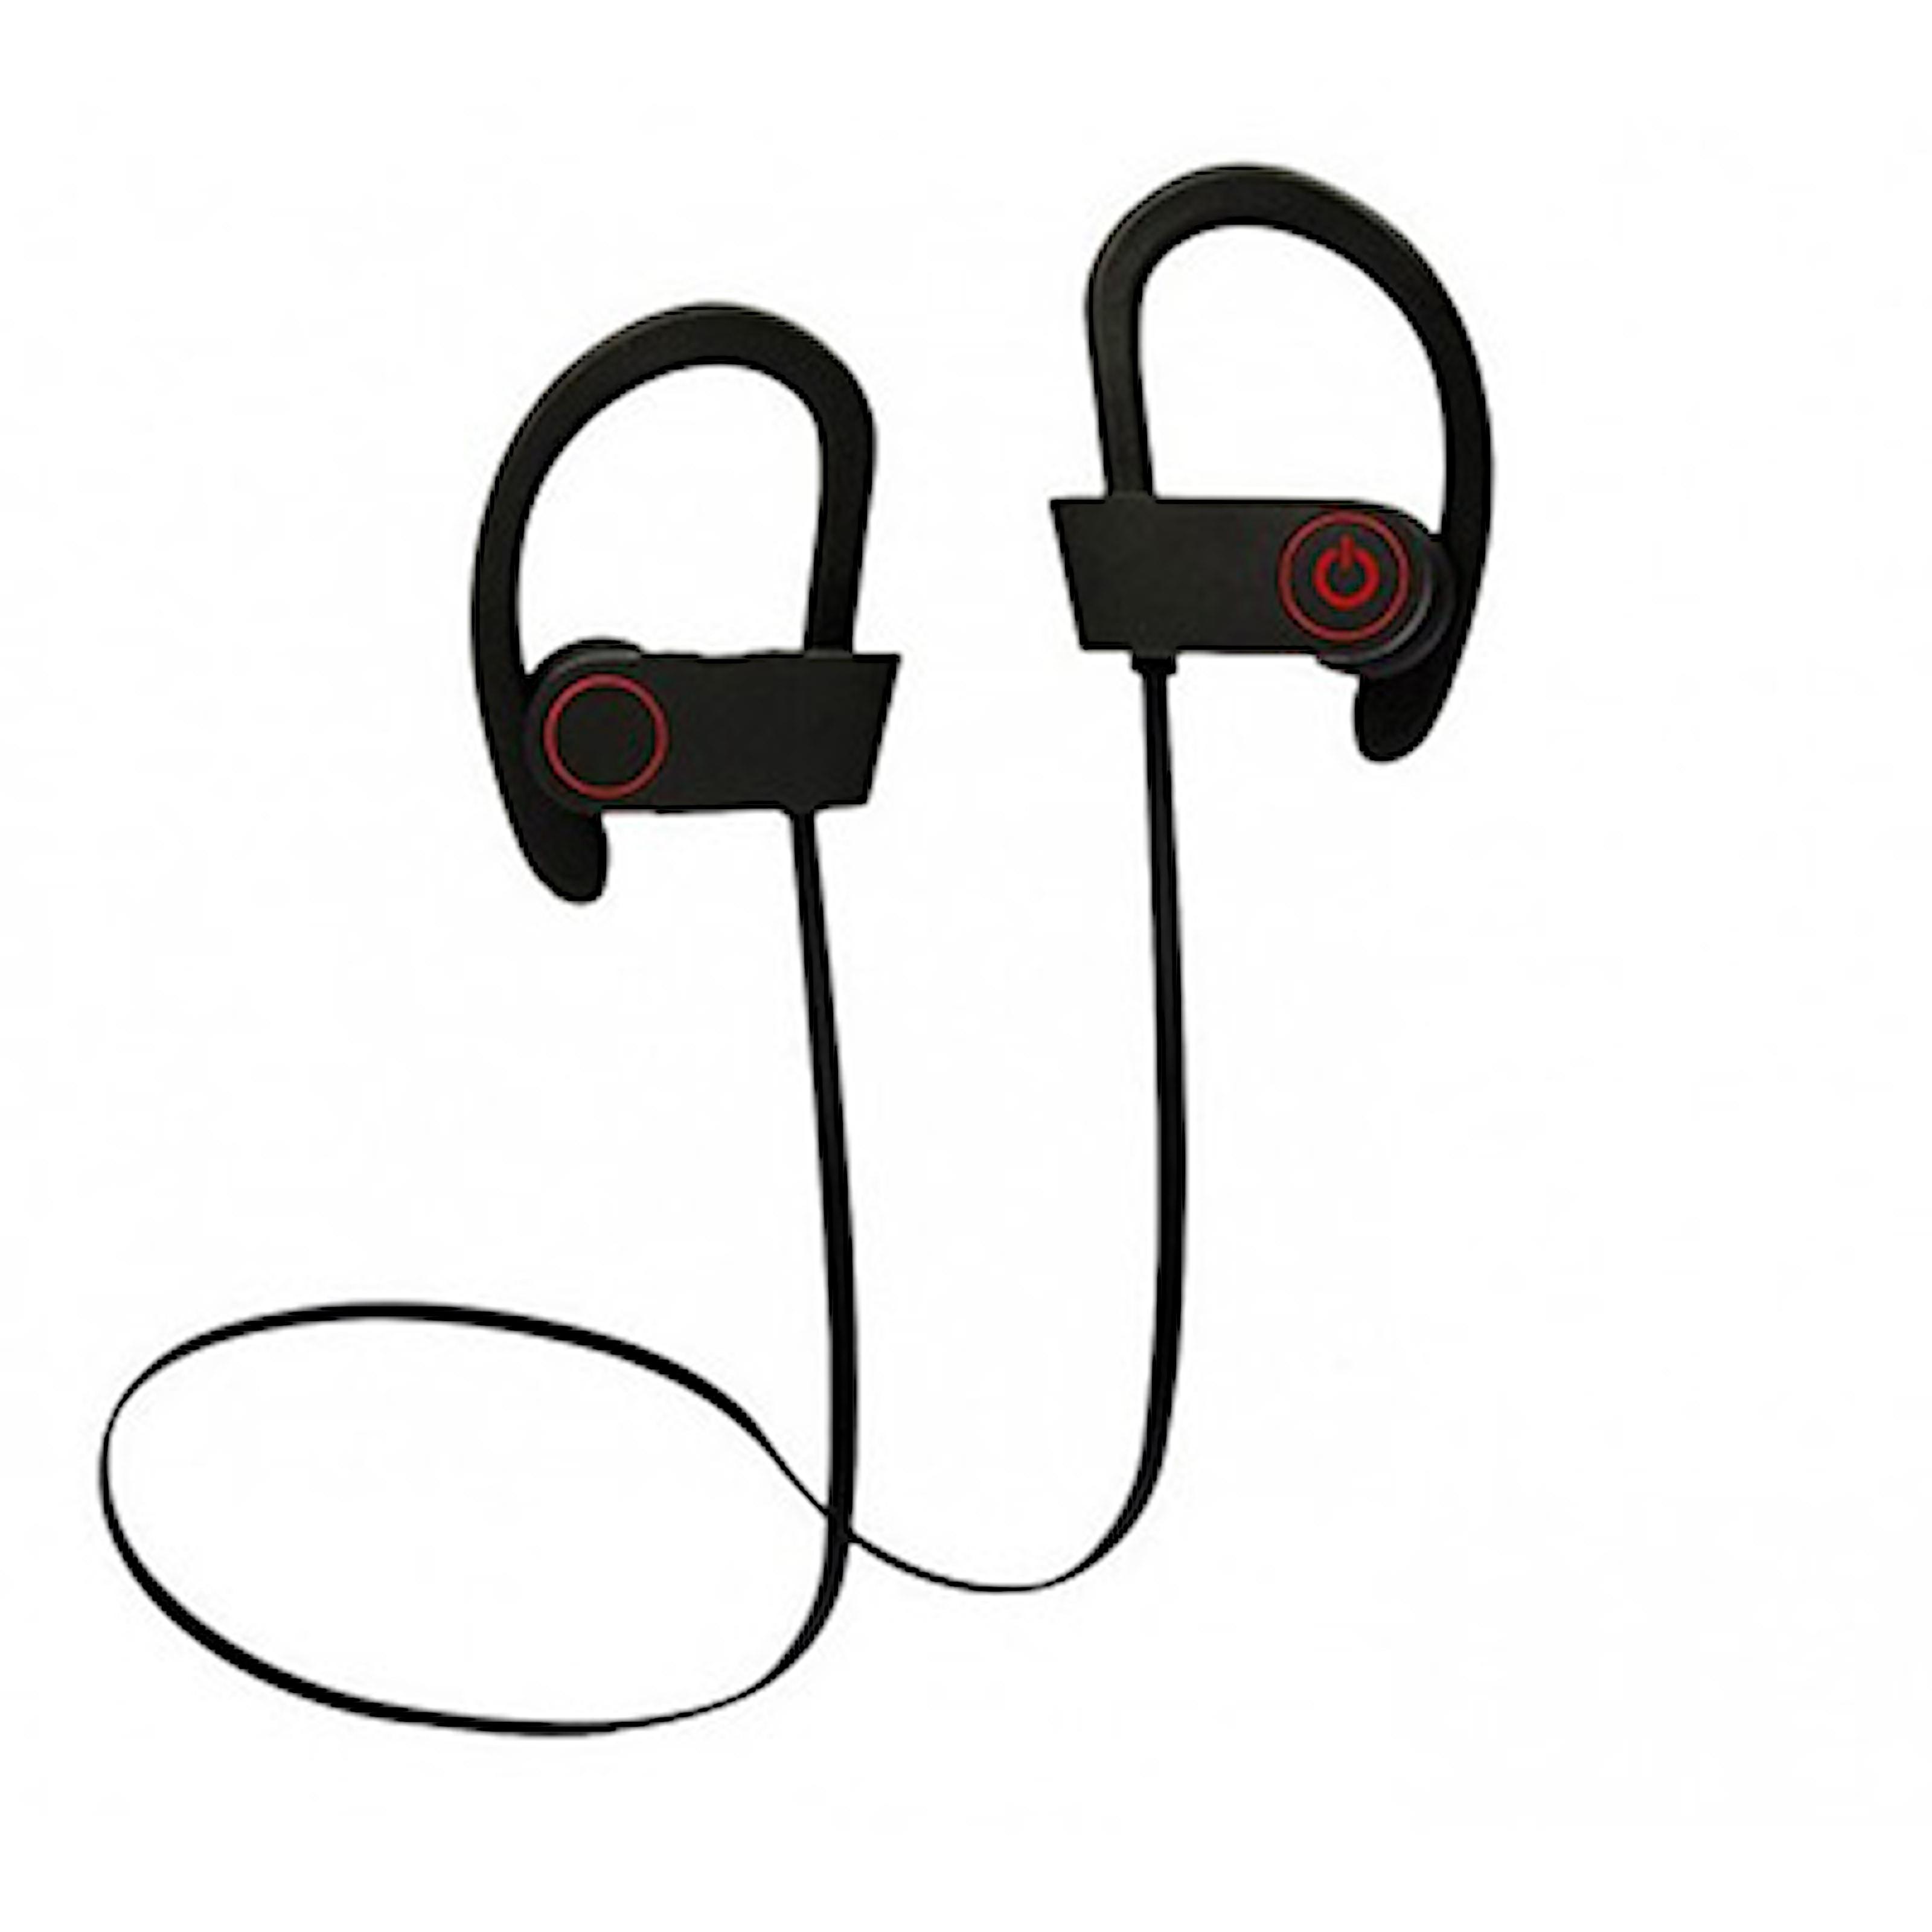 Svart/Svart, Bluetooth Sports Headphones, Bluetooth hodetelefoner, ,